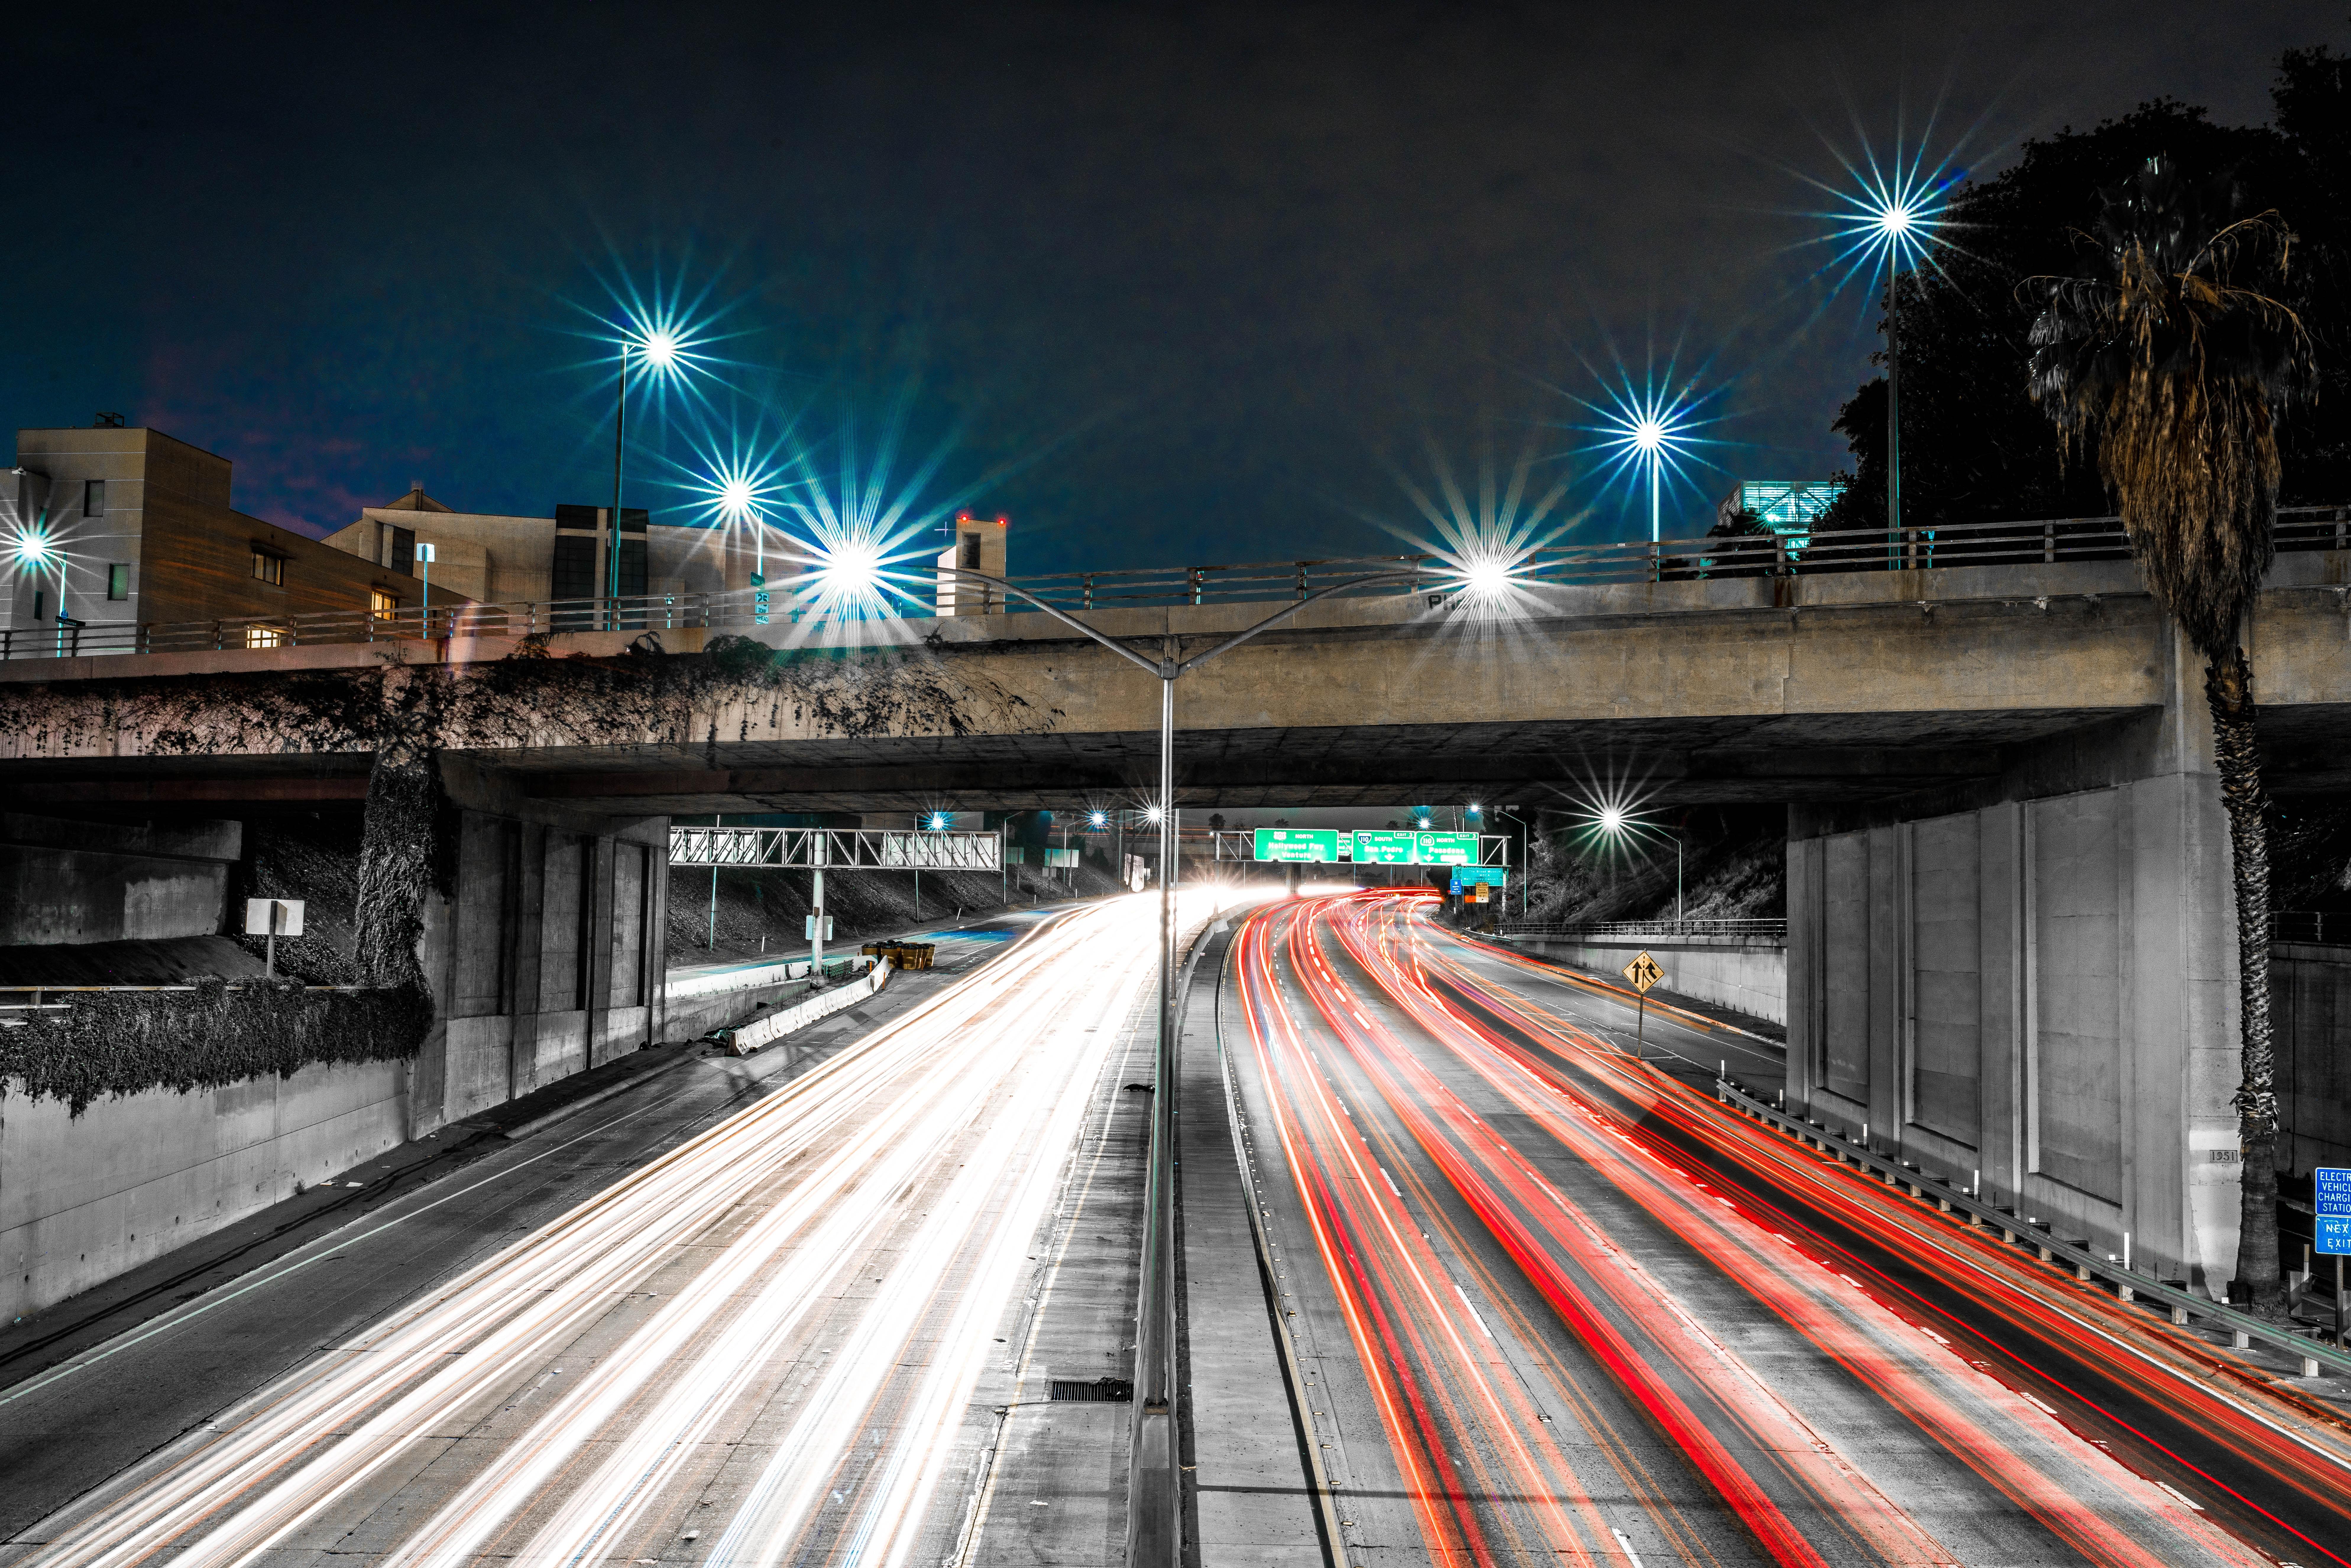 car lights on night time